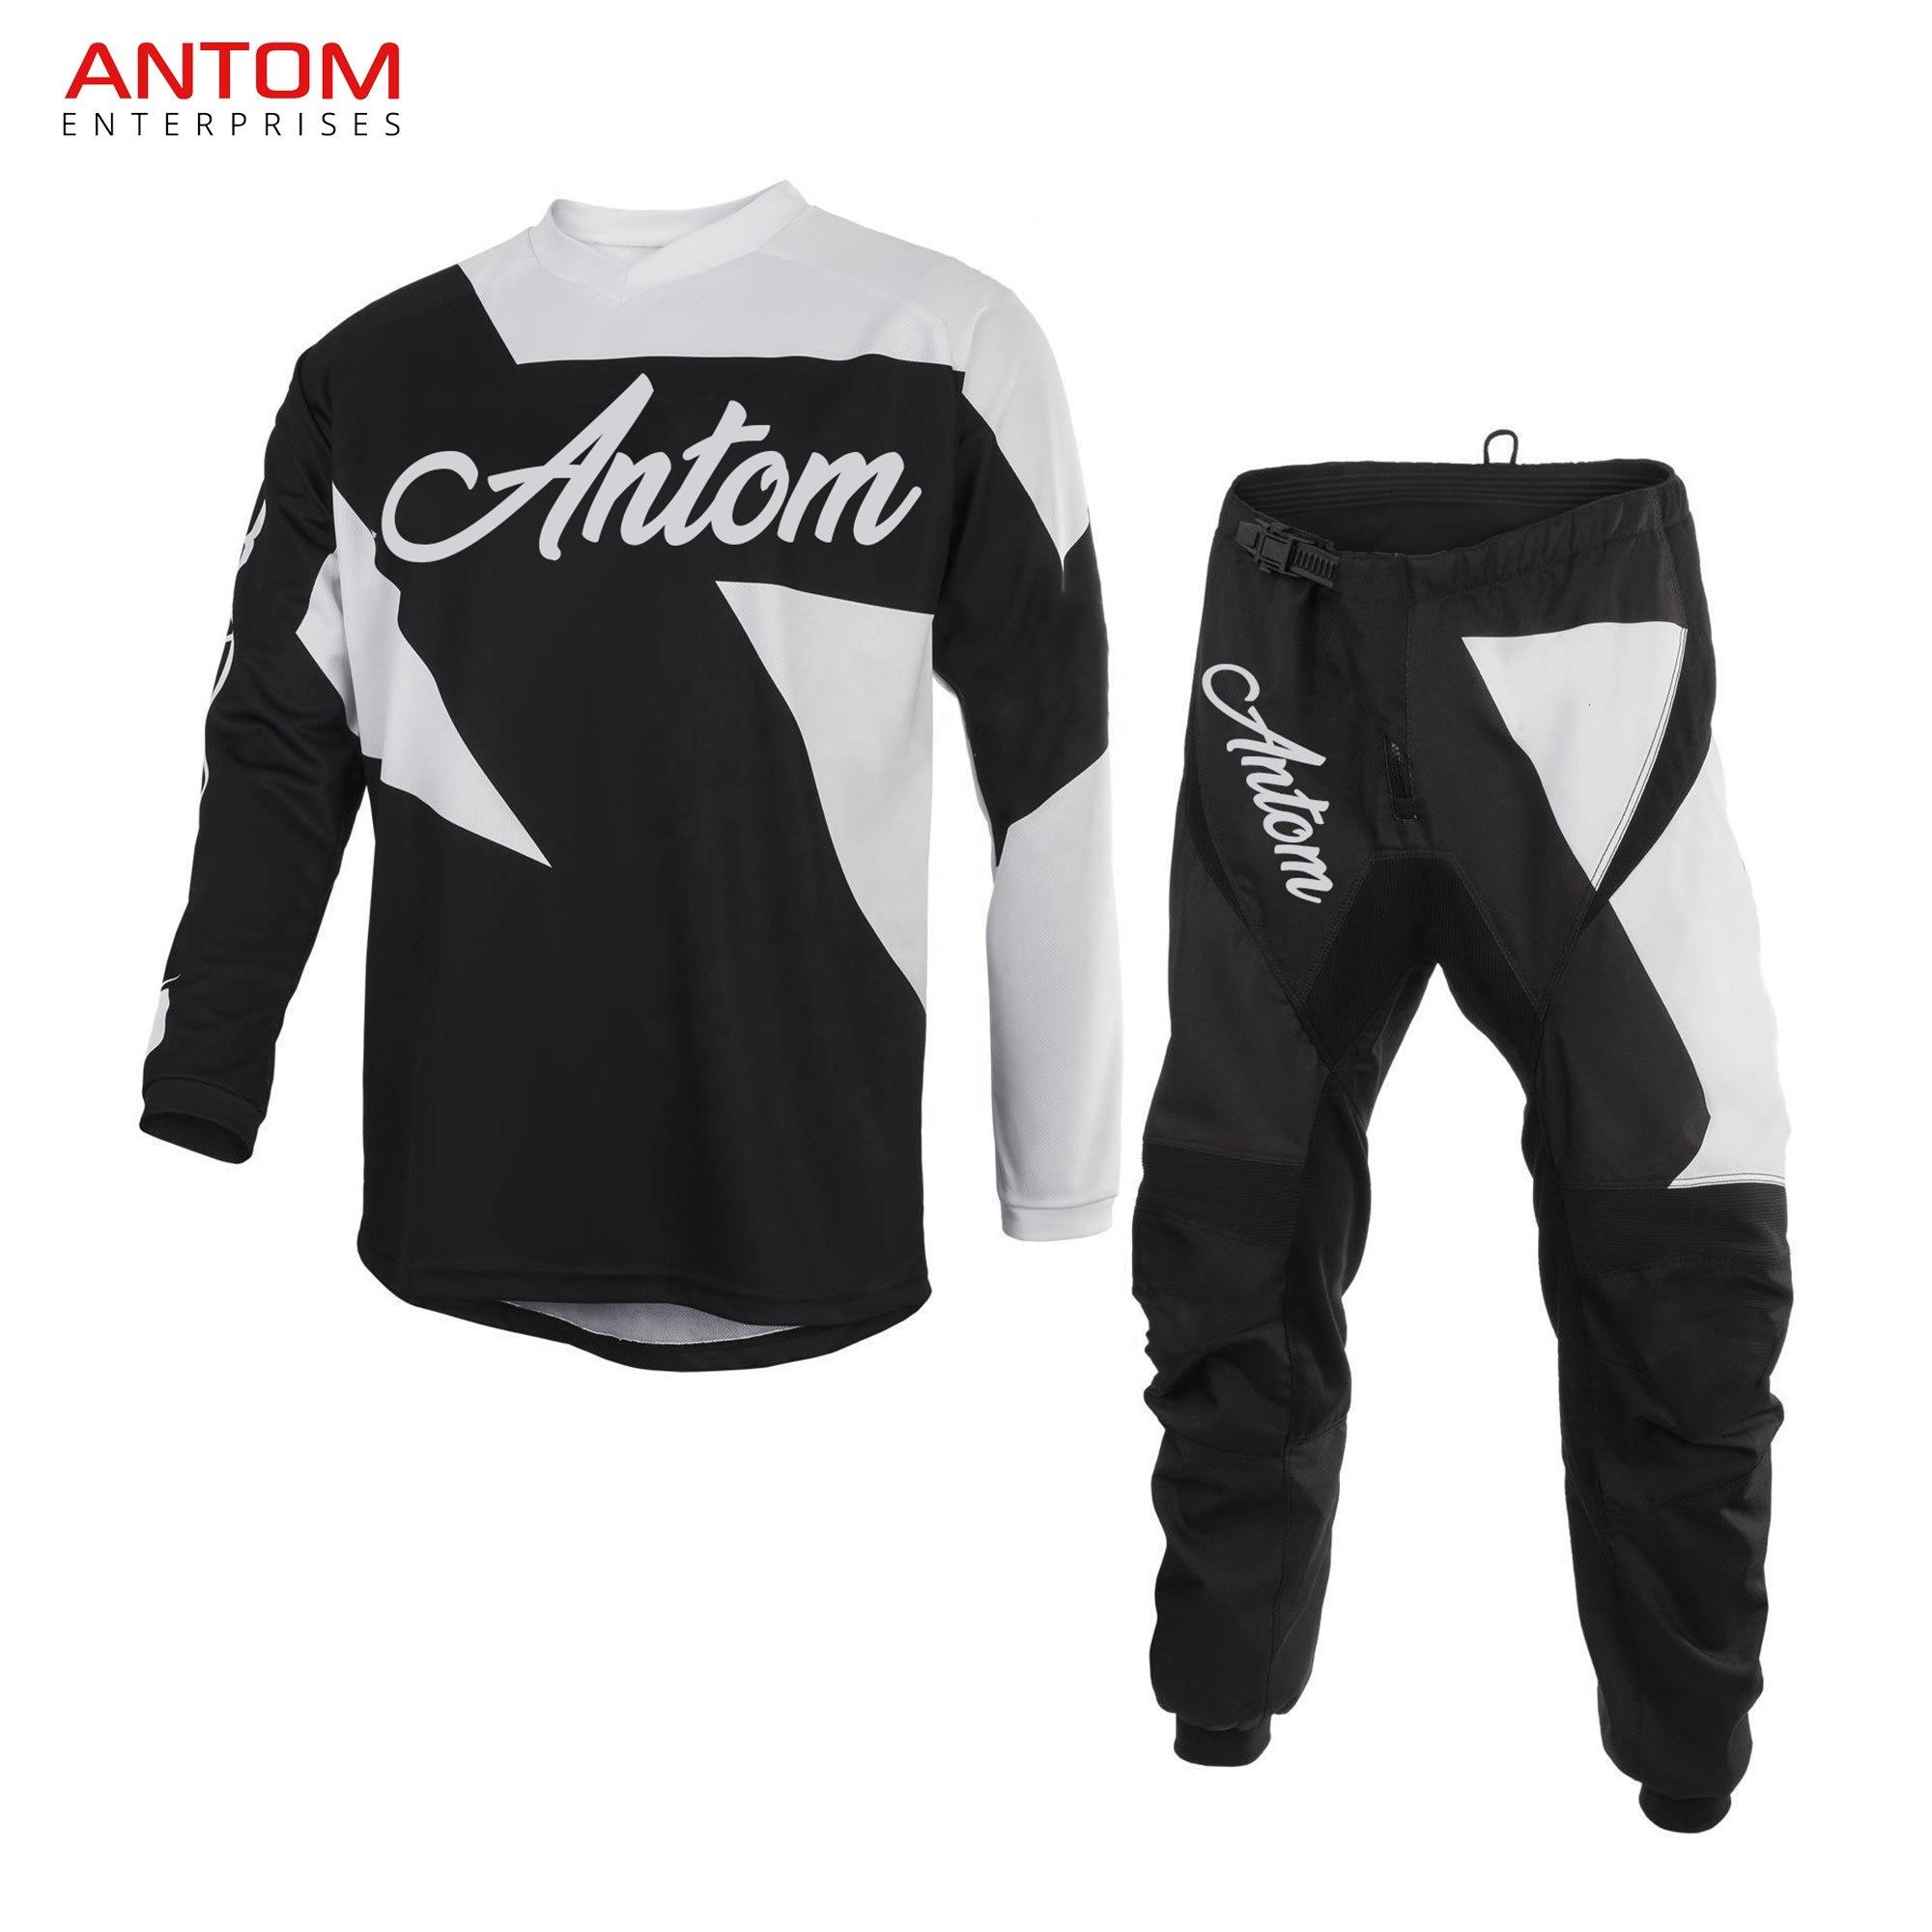 Protective Gears Motocross Suit Dirt Bike Riding Jacket Jersey Pant New Design Motocross Suit Made By Antom Enterprises View Motocross Race Suit Men Big Size M 3xl 4xl Customized Product